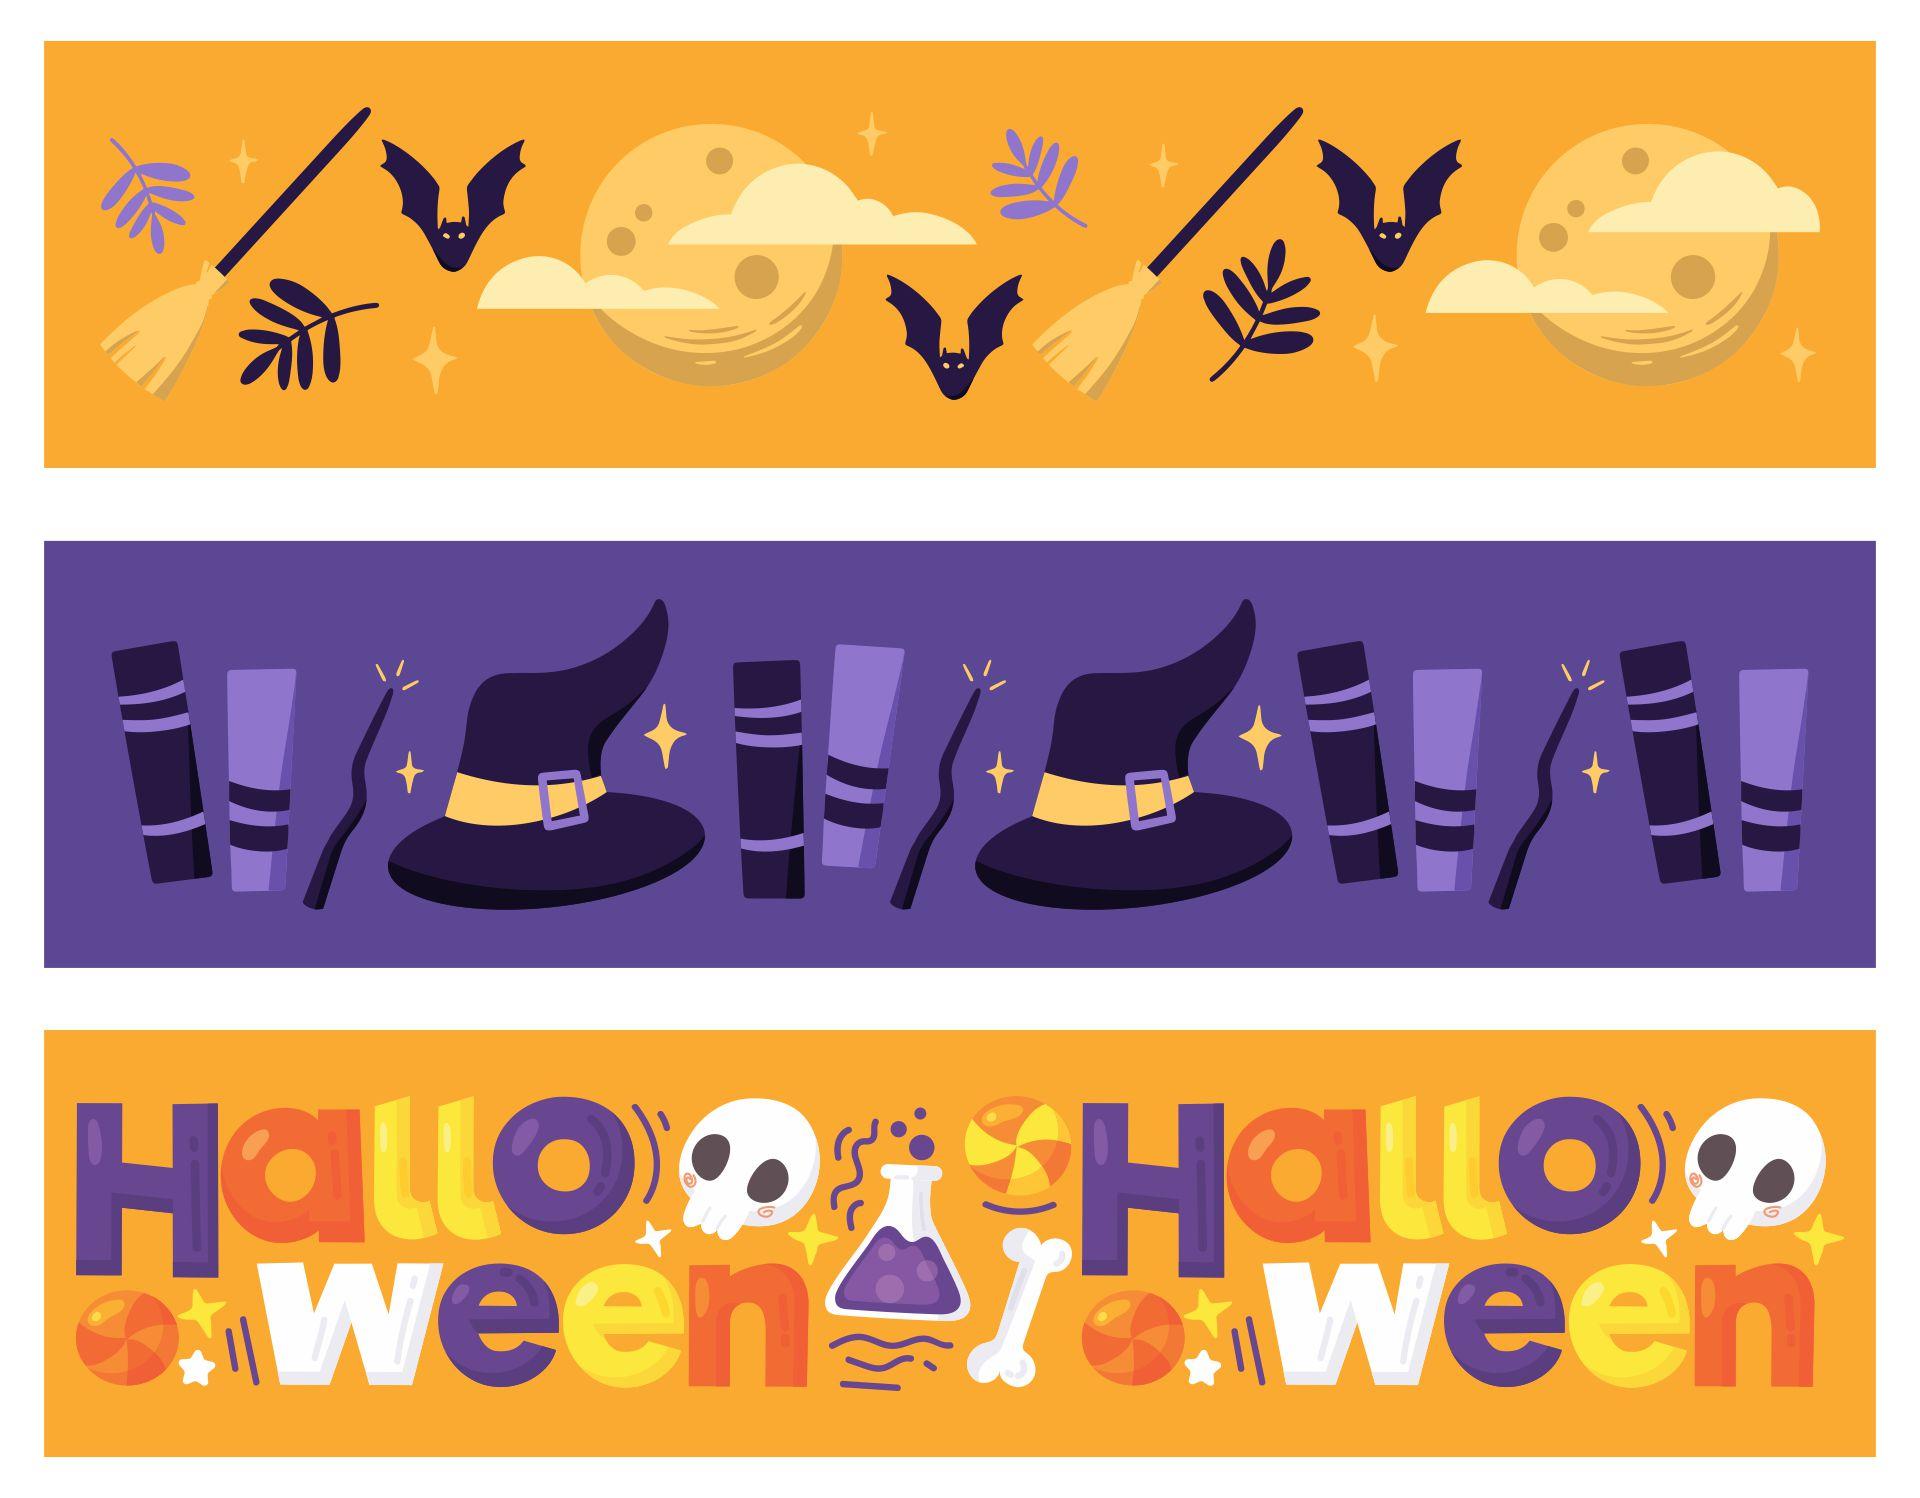 Printable Halloween Bookmarks for Kids